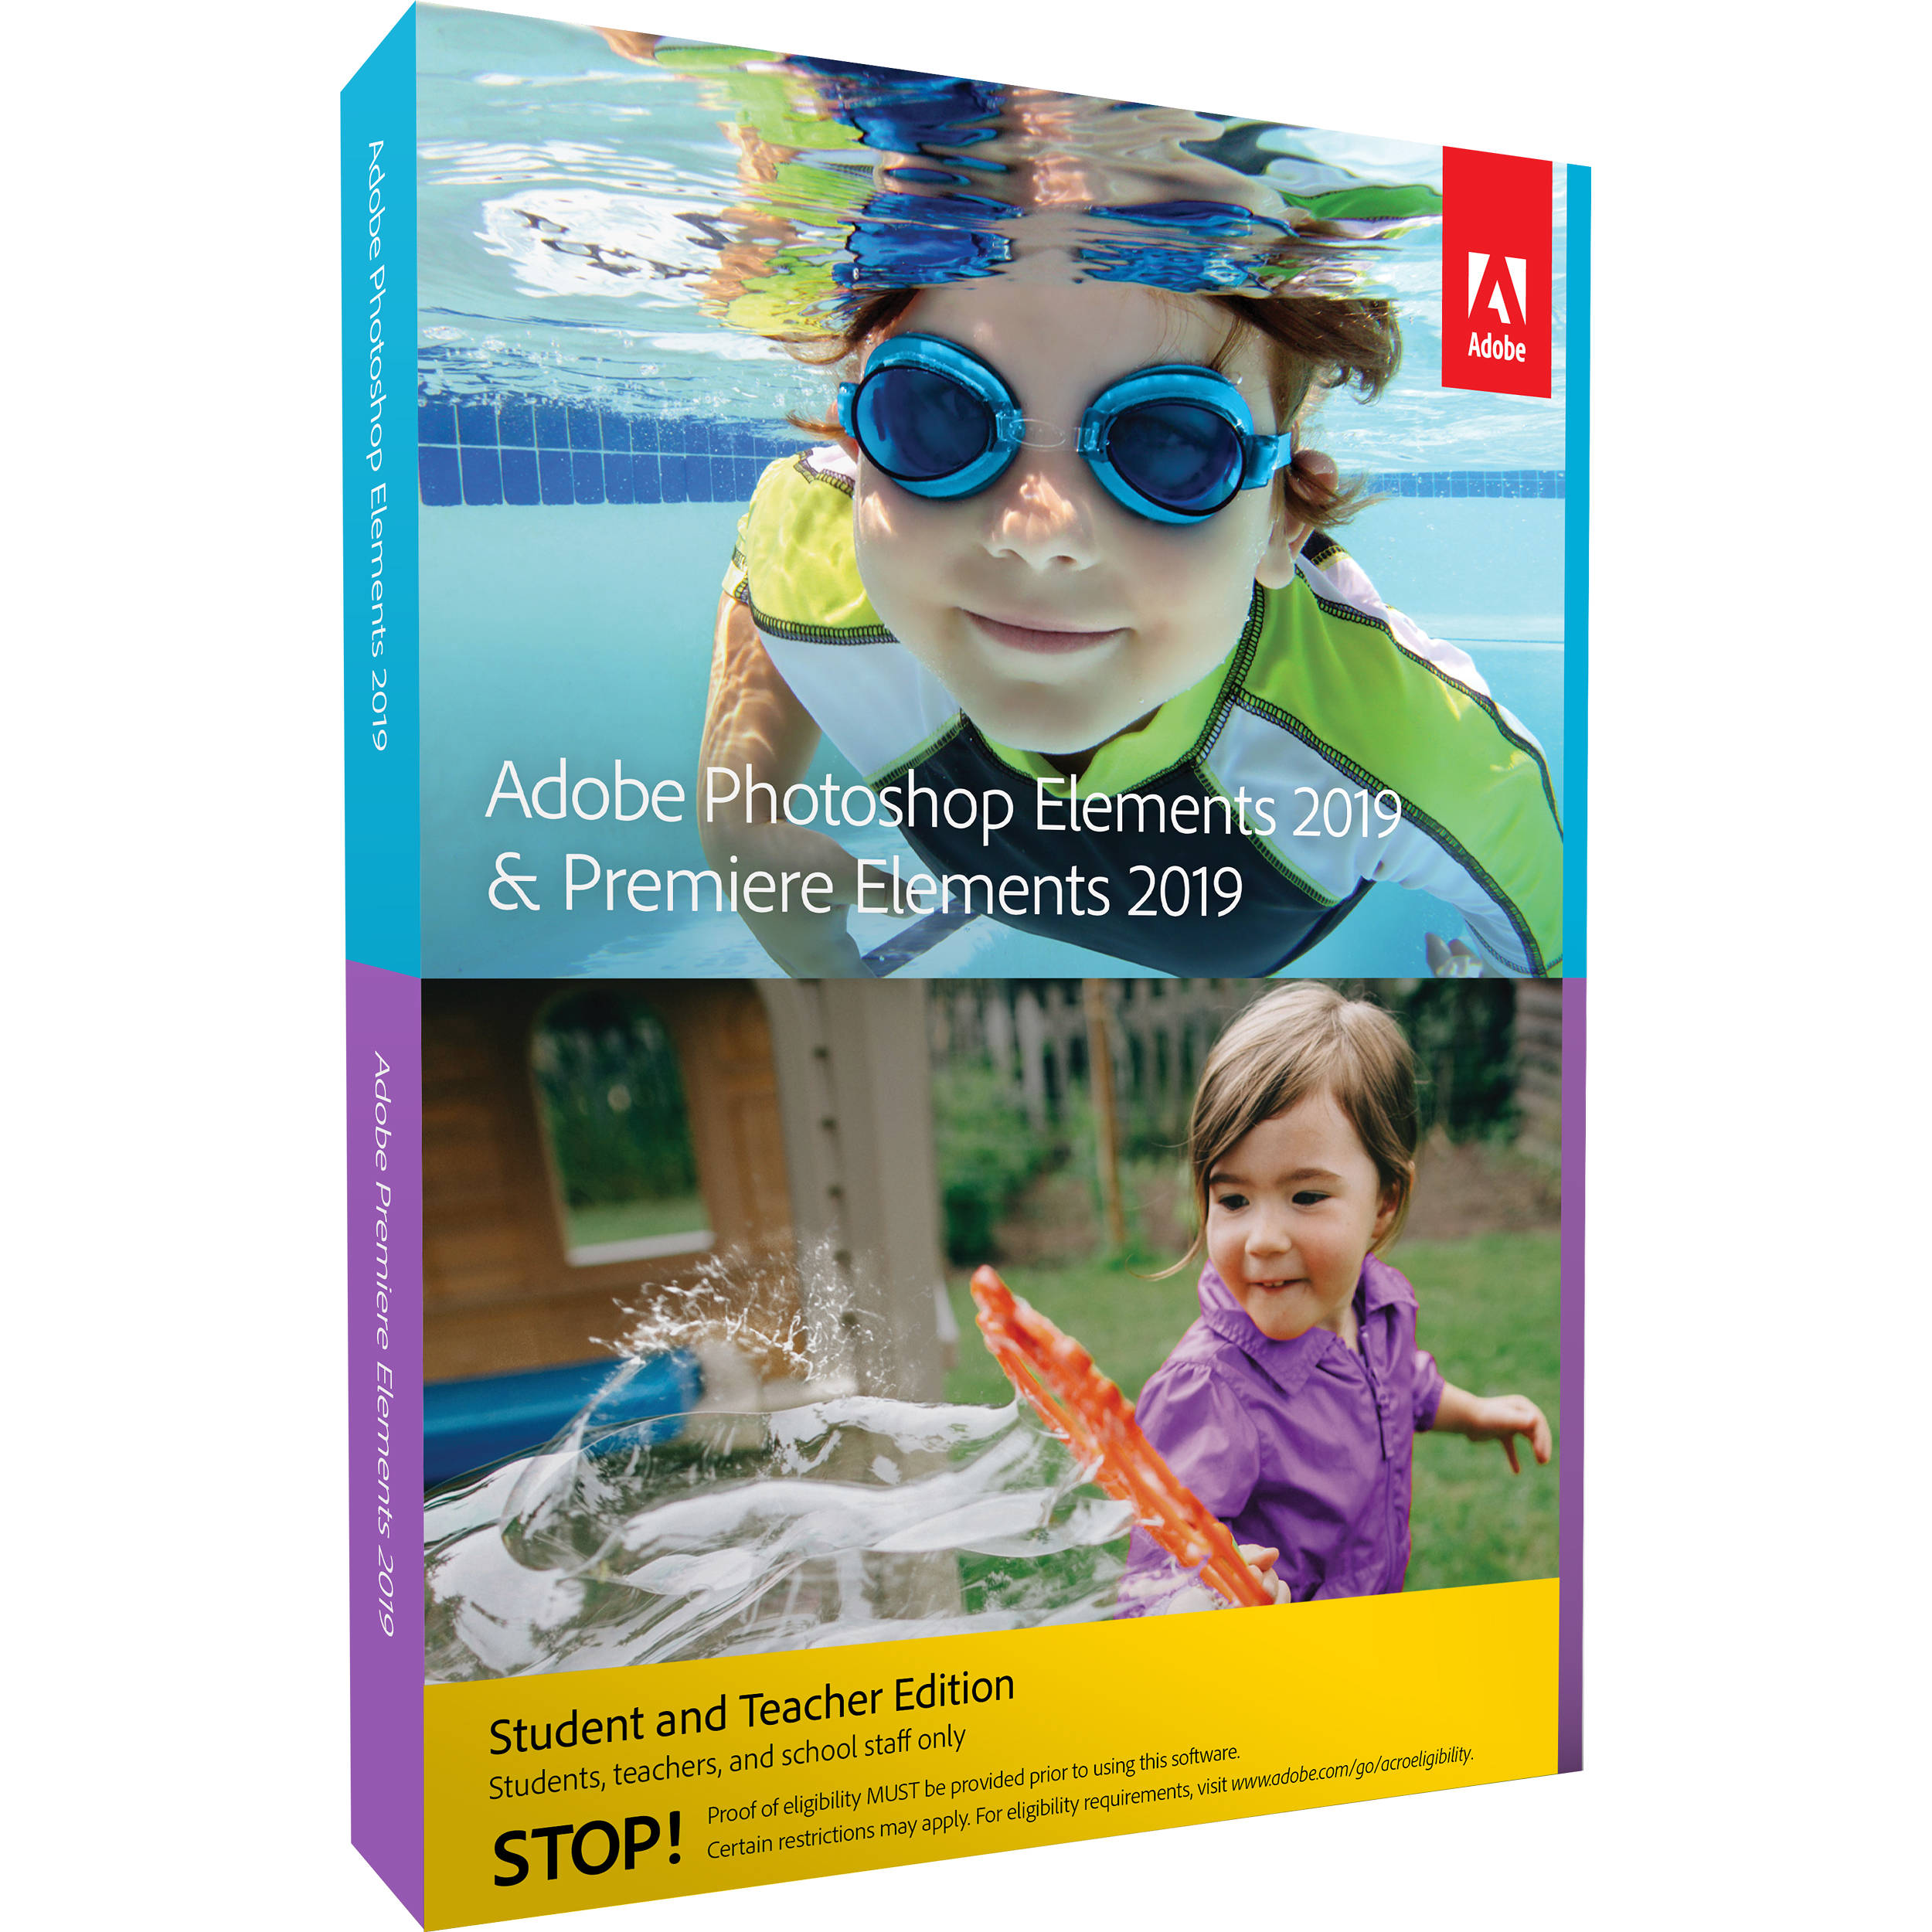 Adobe Photoshop Elements 2019 & Premiere Elements 2019 (DVD/Download Code,  Mac and Windows, Student & Teacher Edition)